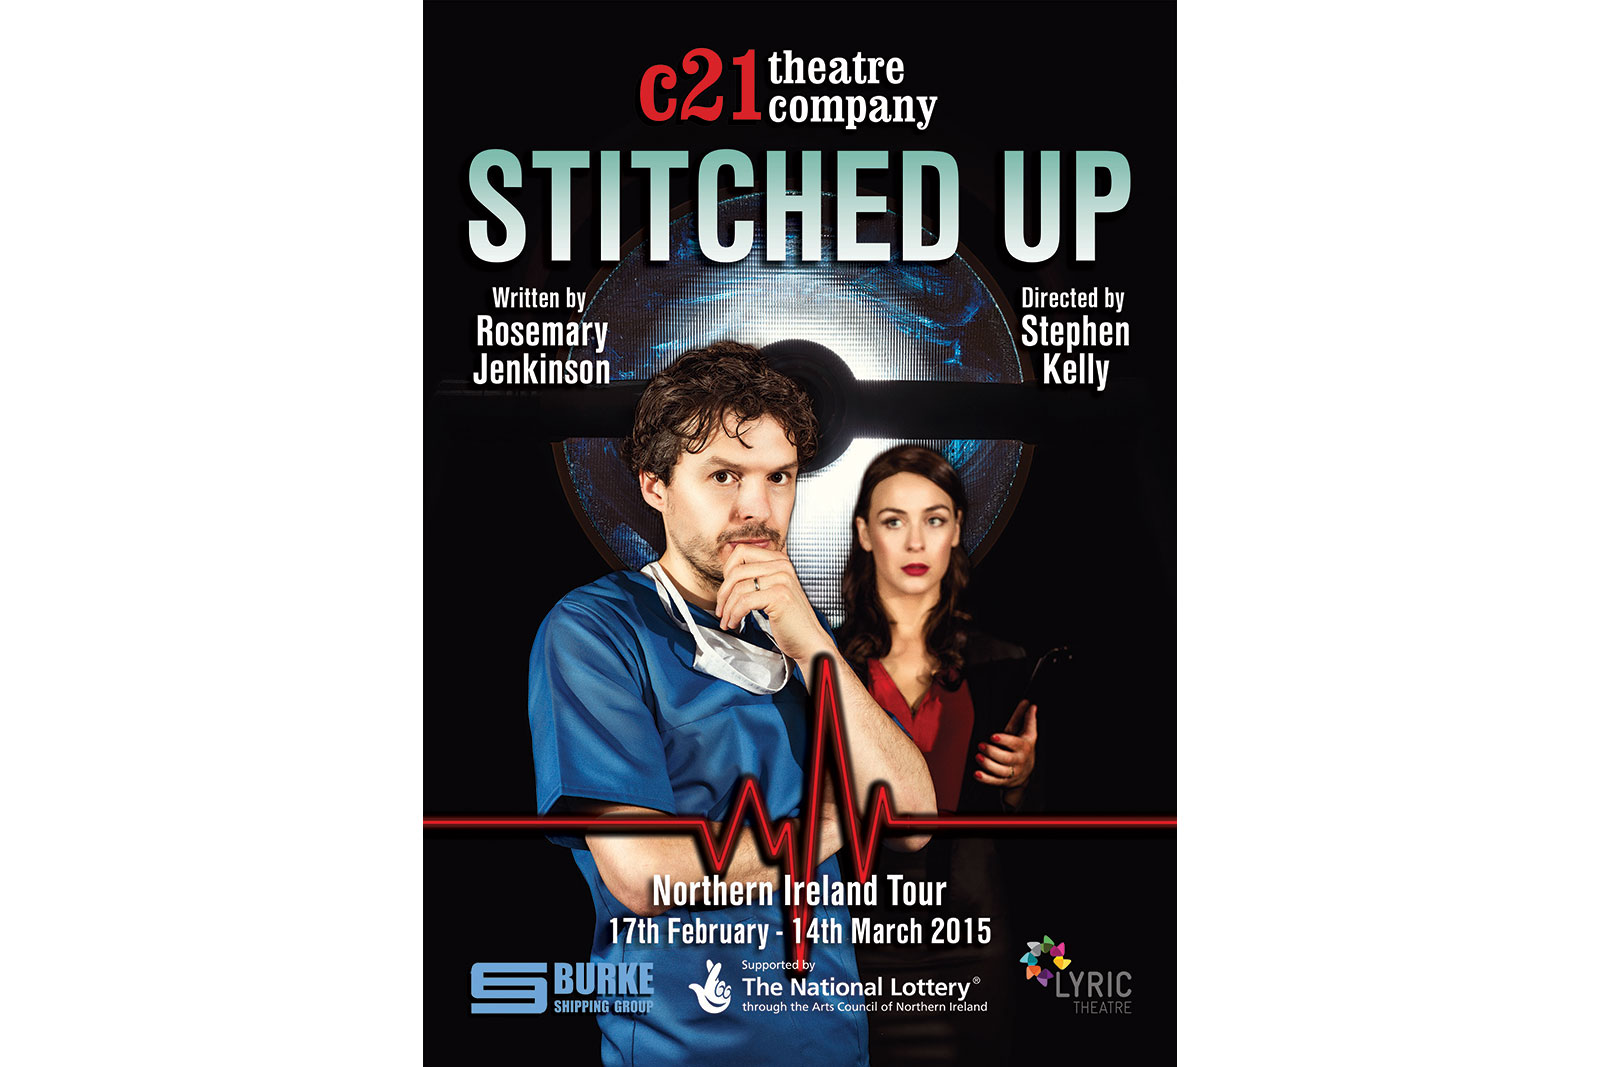 c21 Theatre Company Stitched Up